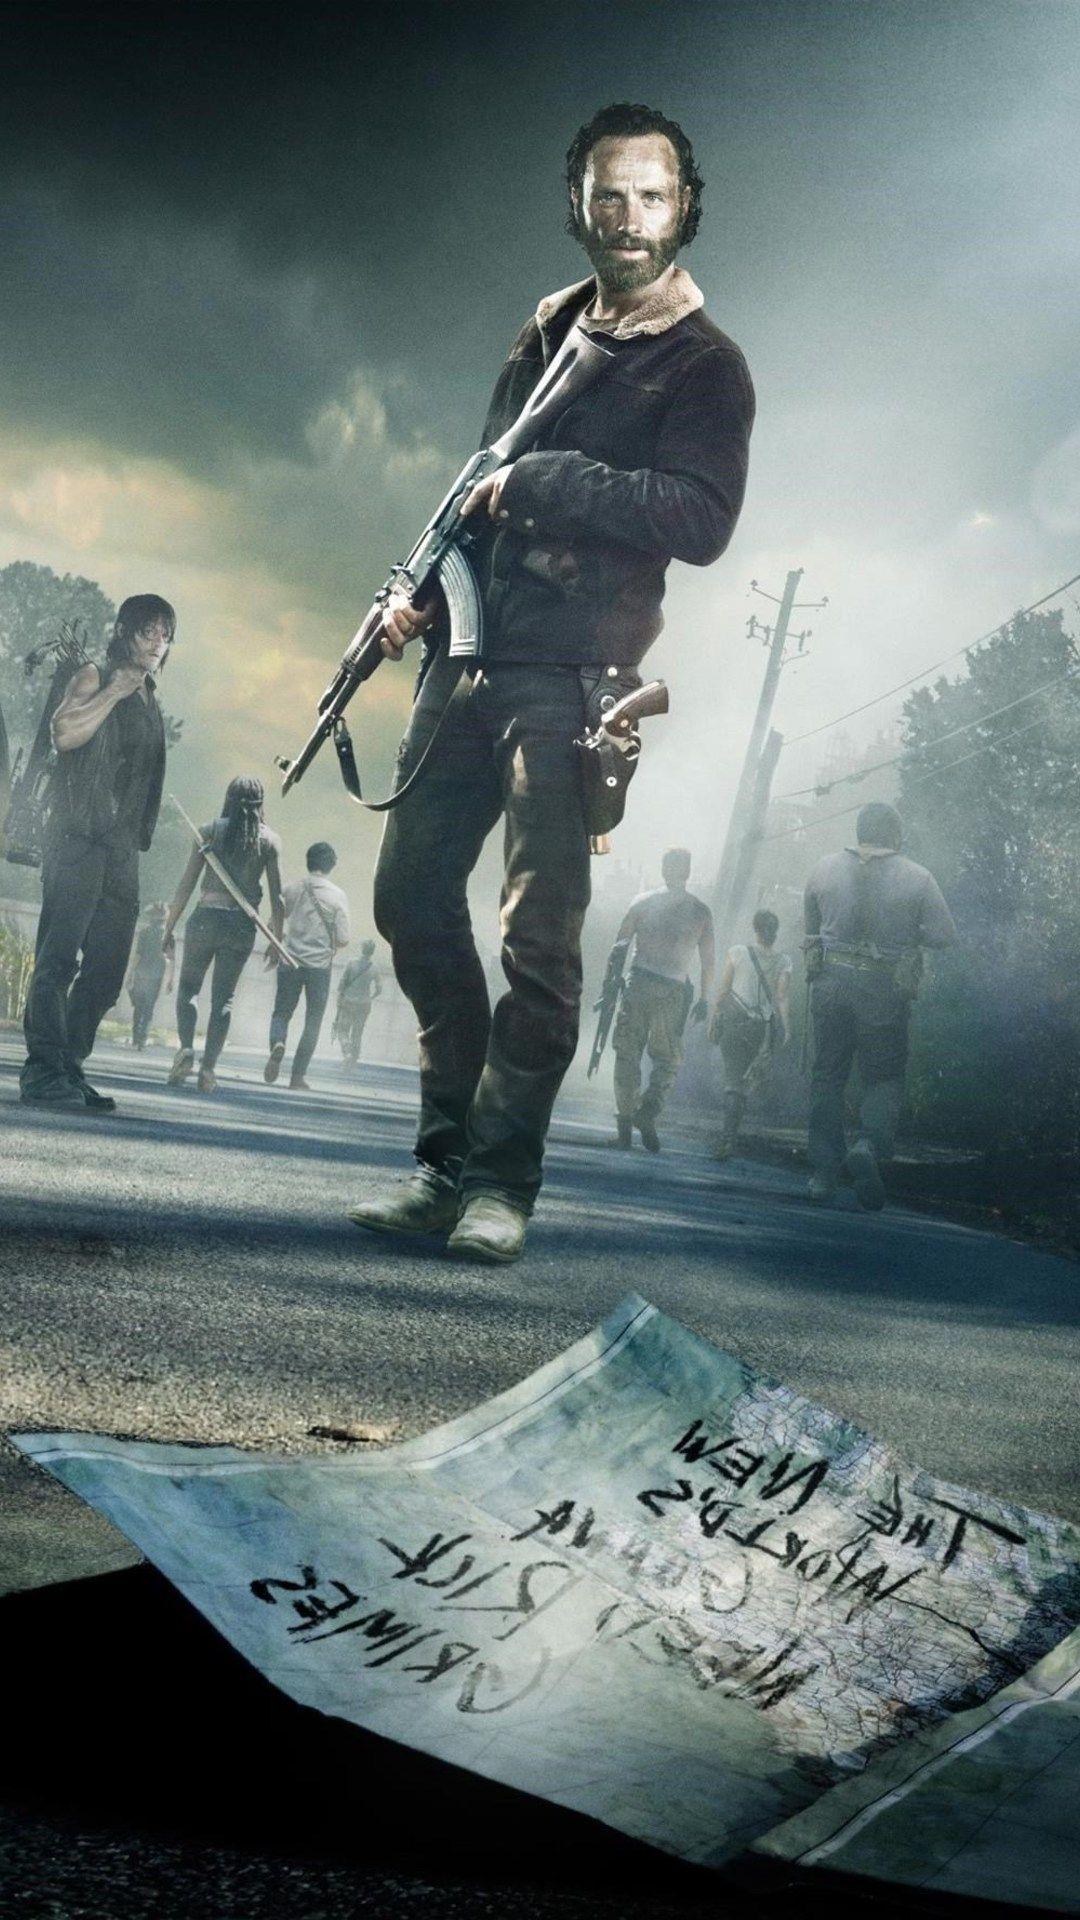 Negan The Walking Dead Wallpaper Ios Cinematics Wallpapers Ideas